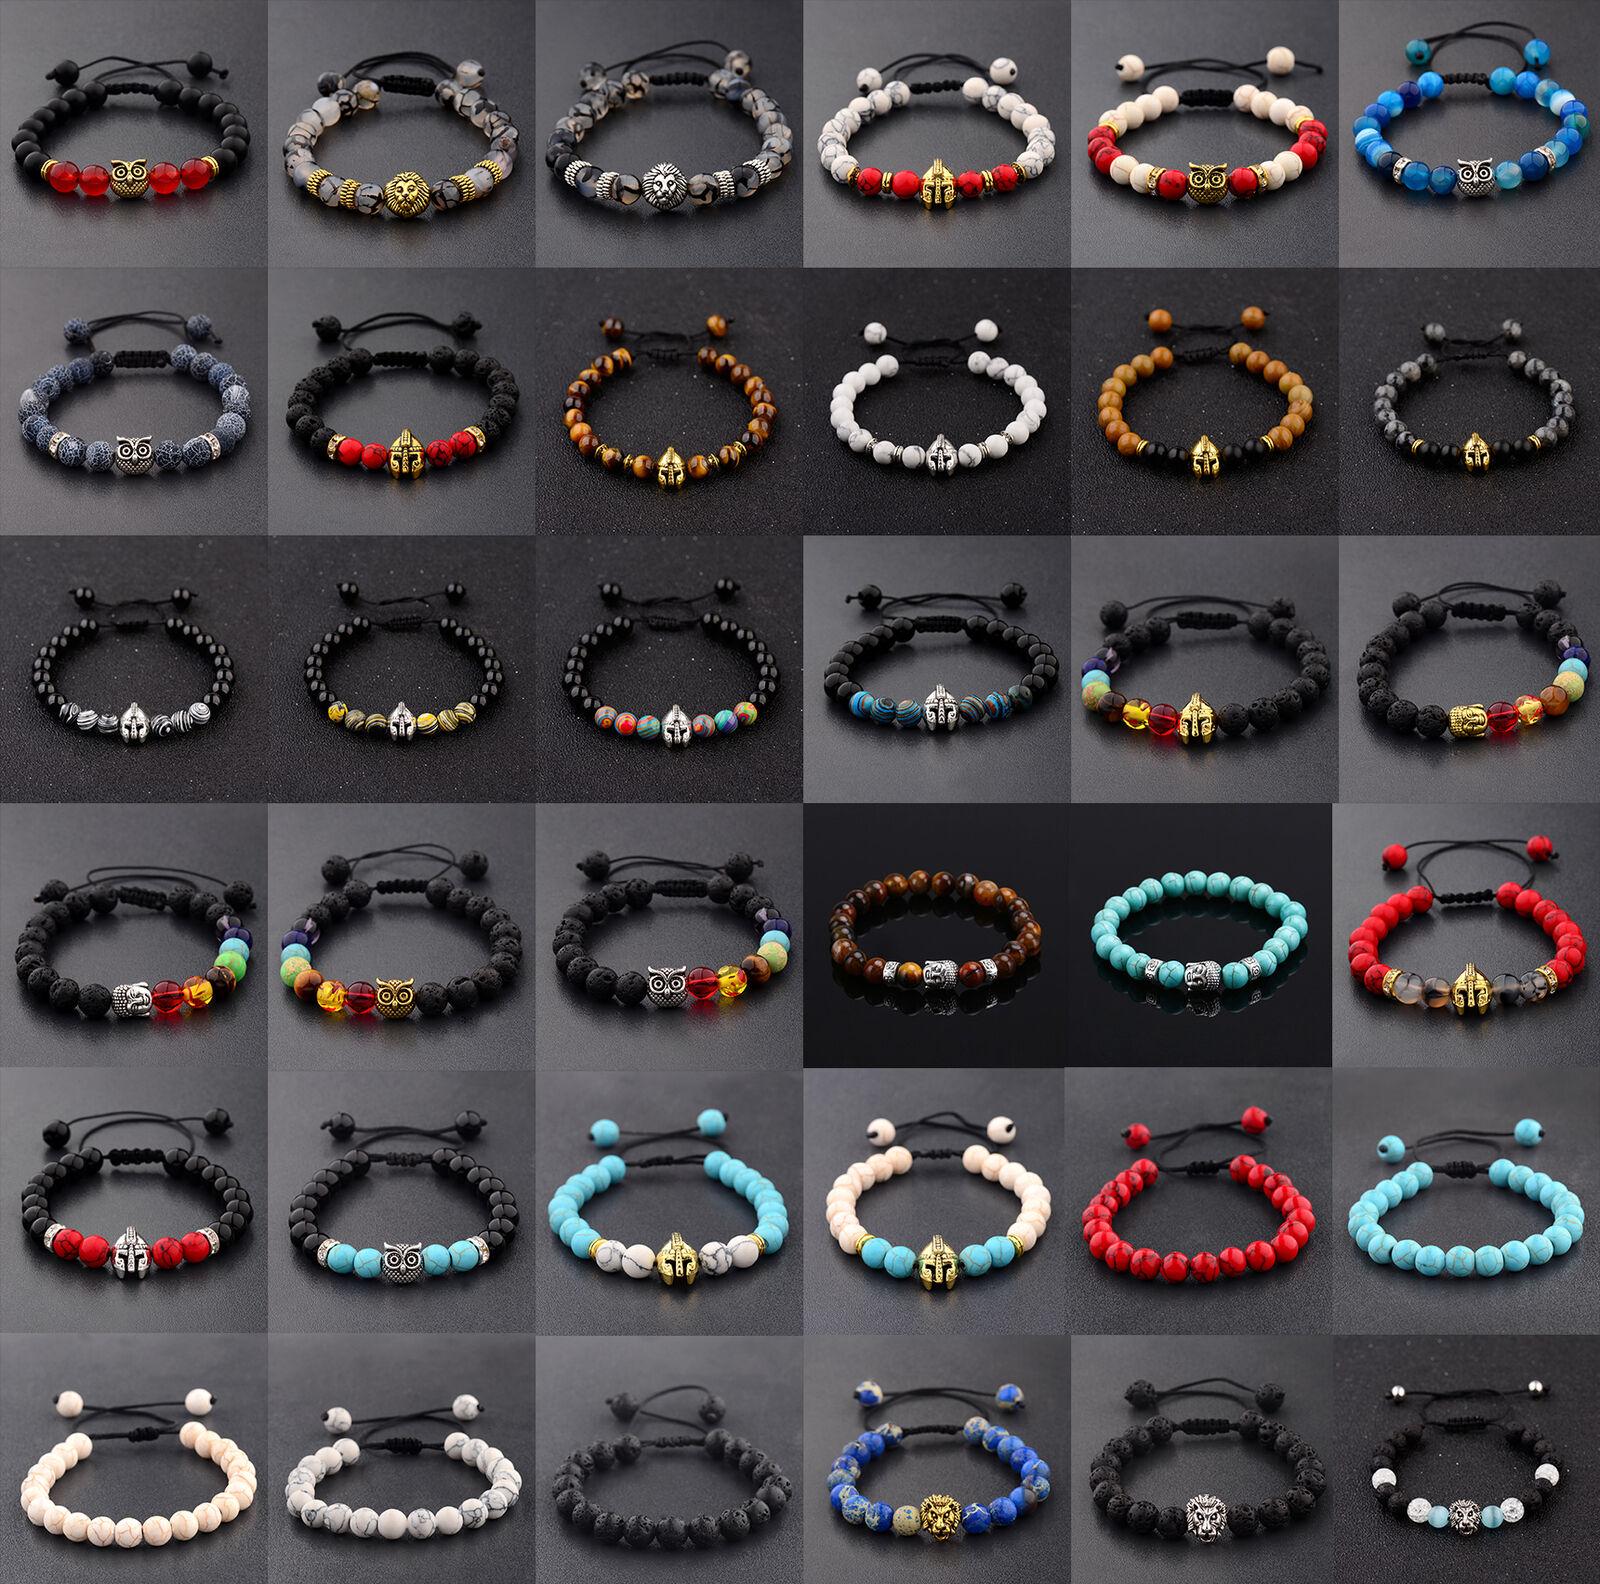 1Pcs Men Women 8MM Gemstone Beaded Braided Bracelets Charm Fashion Jewelry Gift